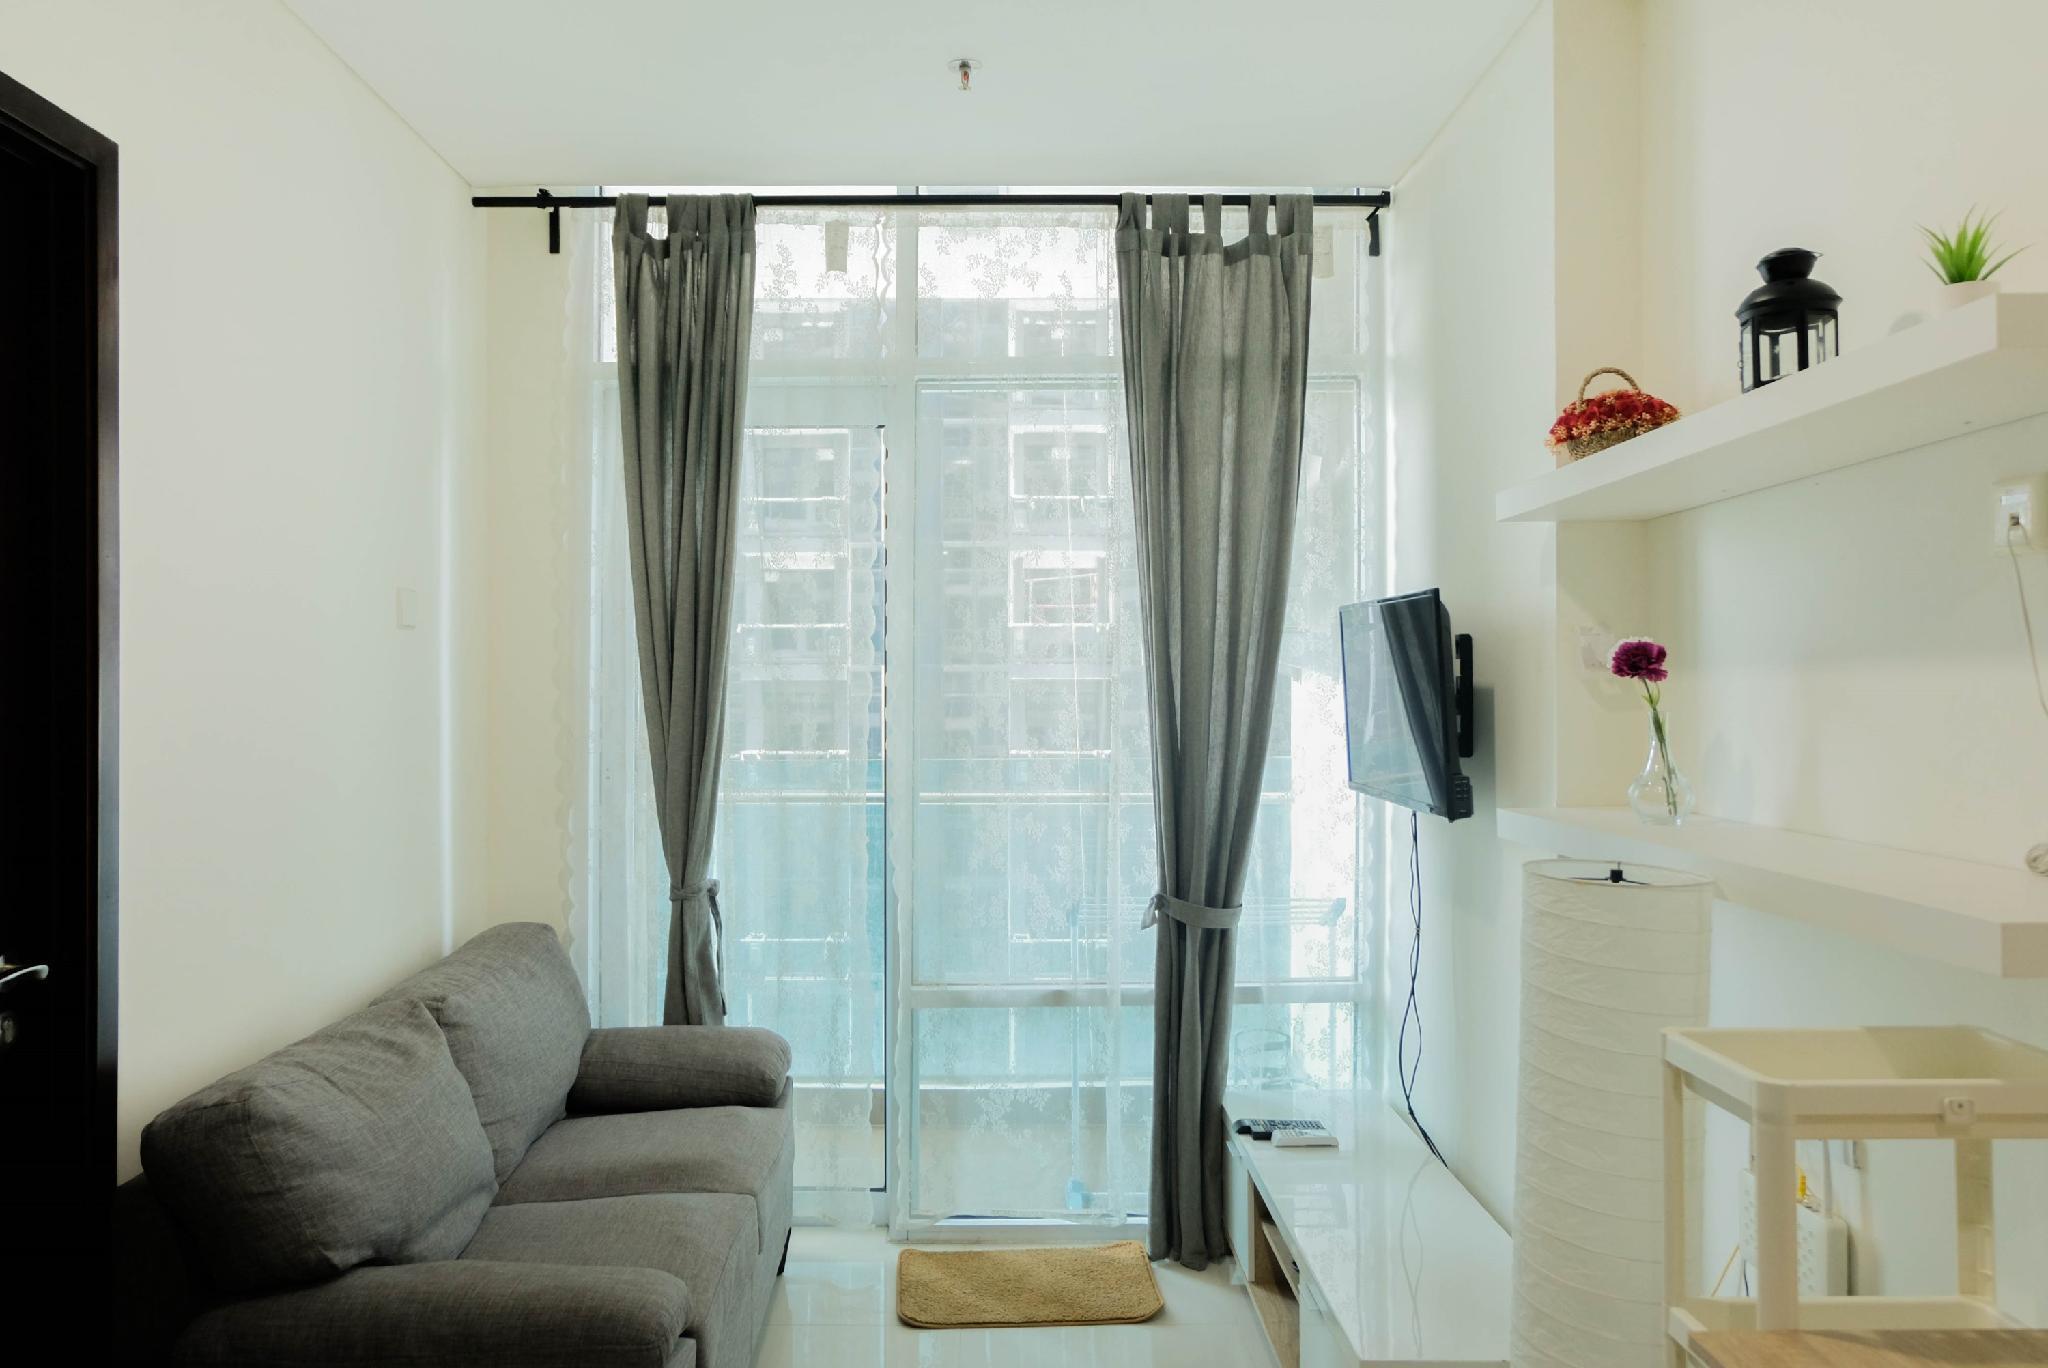 Futuristic 1BR Brooklyn Apartment By Travelio